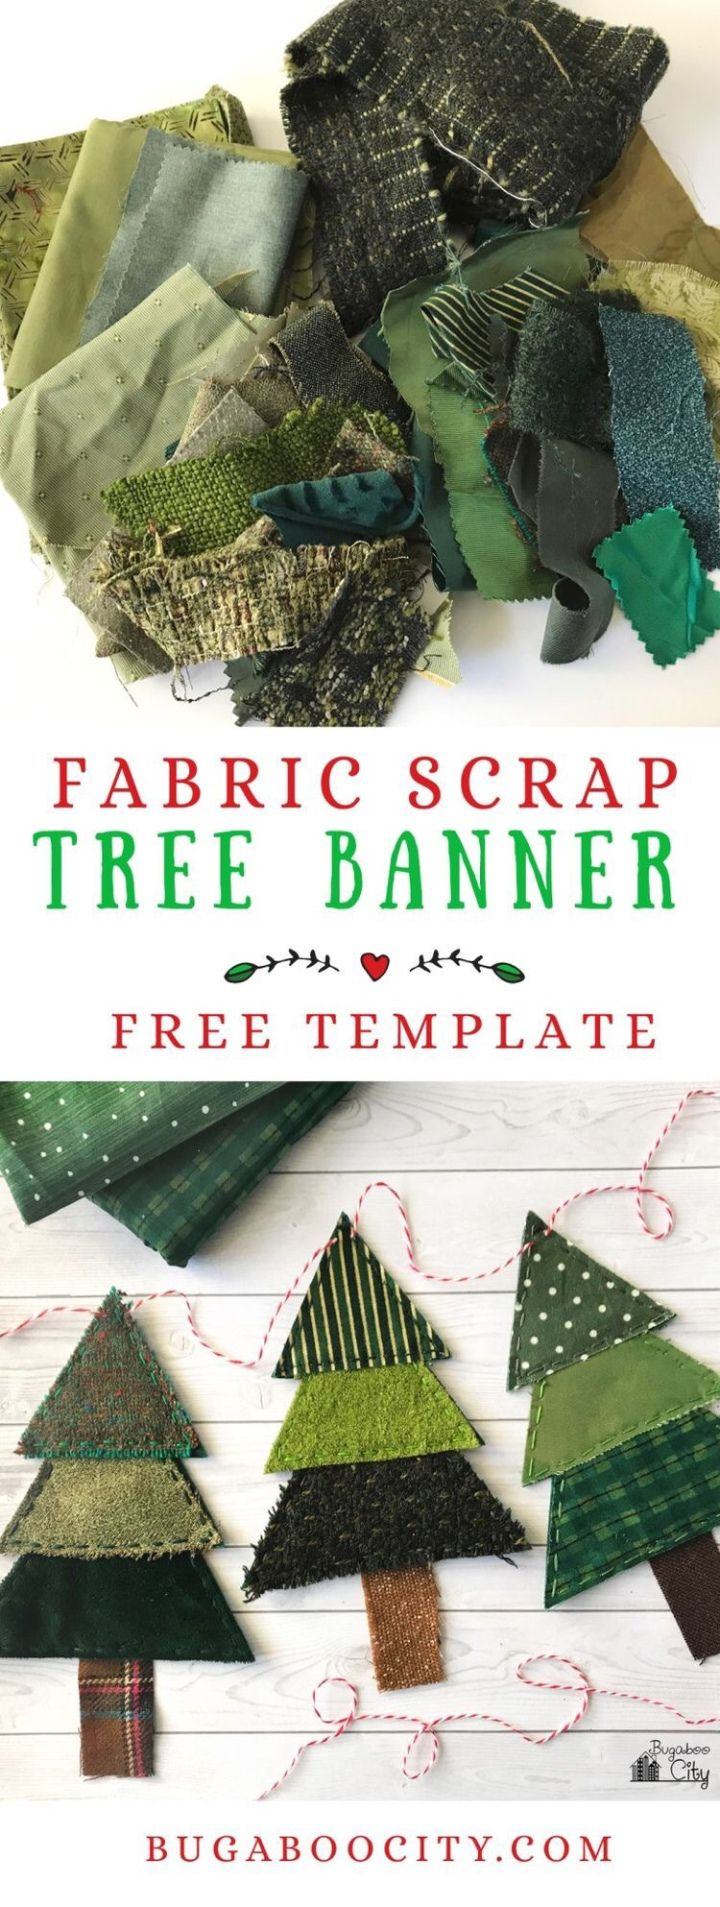 24 Creative Christmas Fabric Crafts -   16 holiday Hacks diy crafts ideas